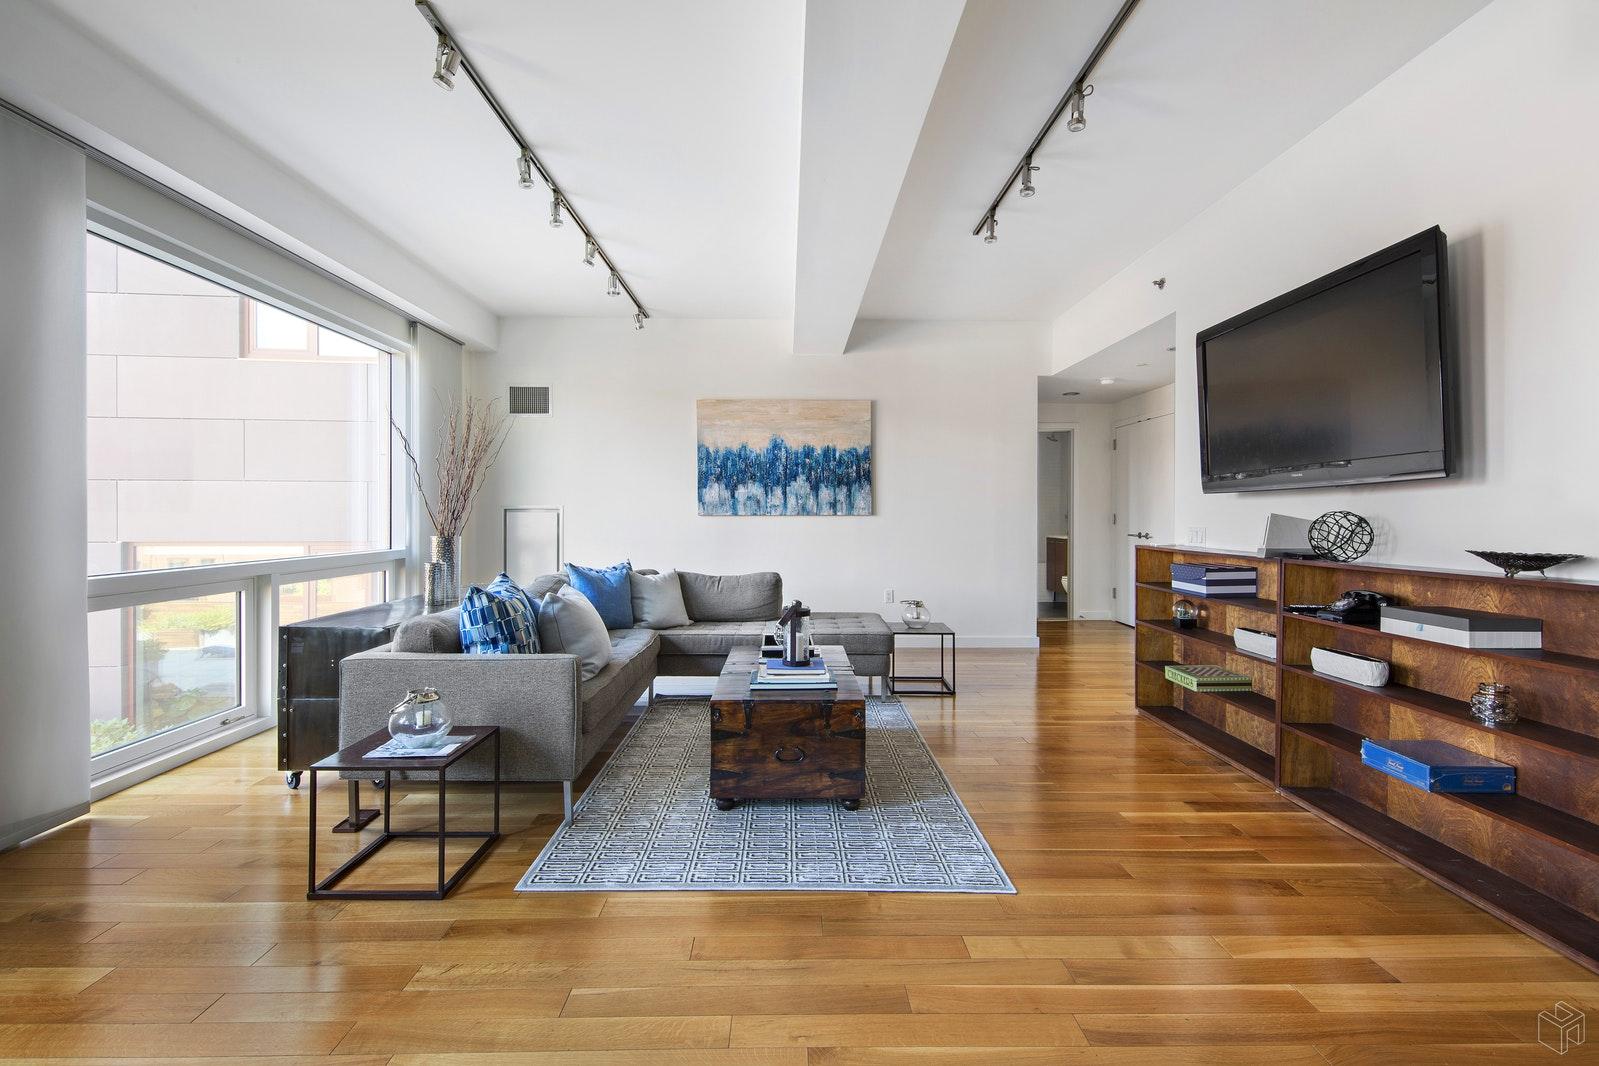 291 UNION STREET 4E, Carroll Gardens, $1,850,000, Web #: 18927025